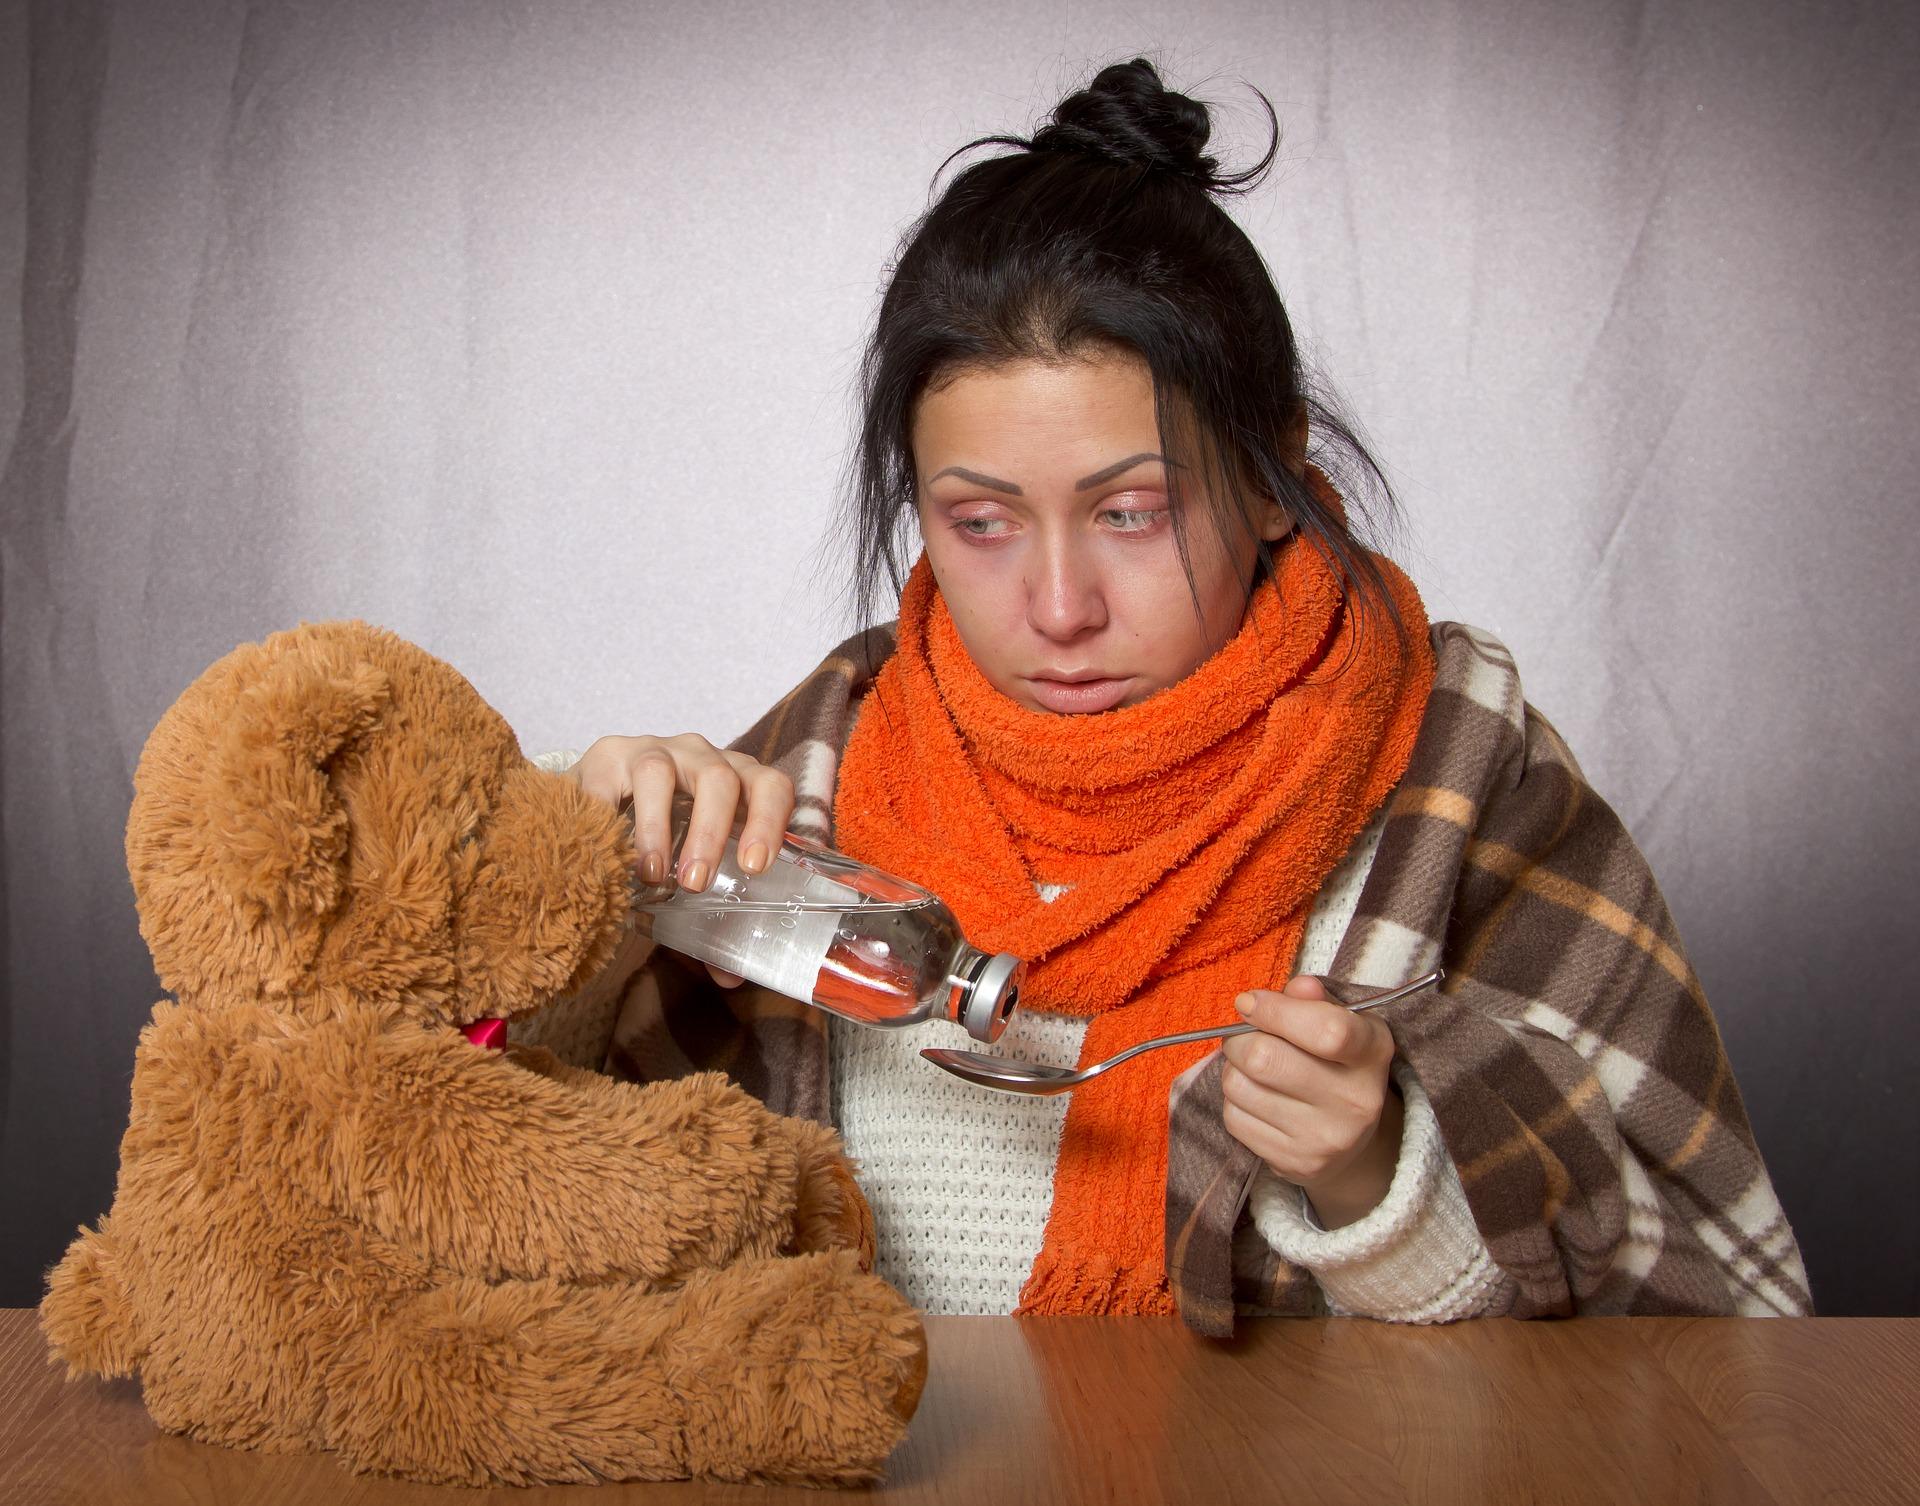 Über 300 gemeldete Grippekranke im Februar